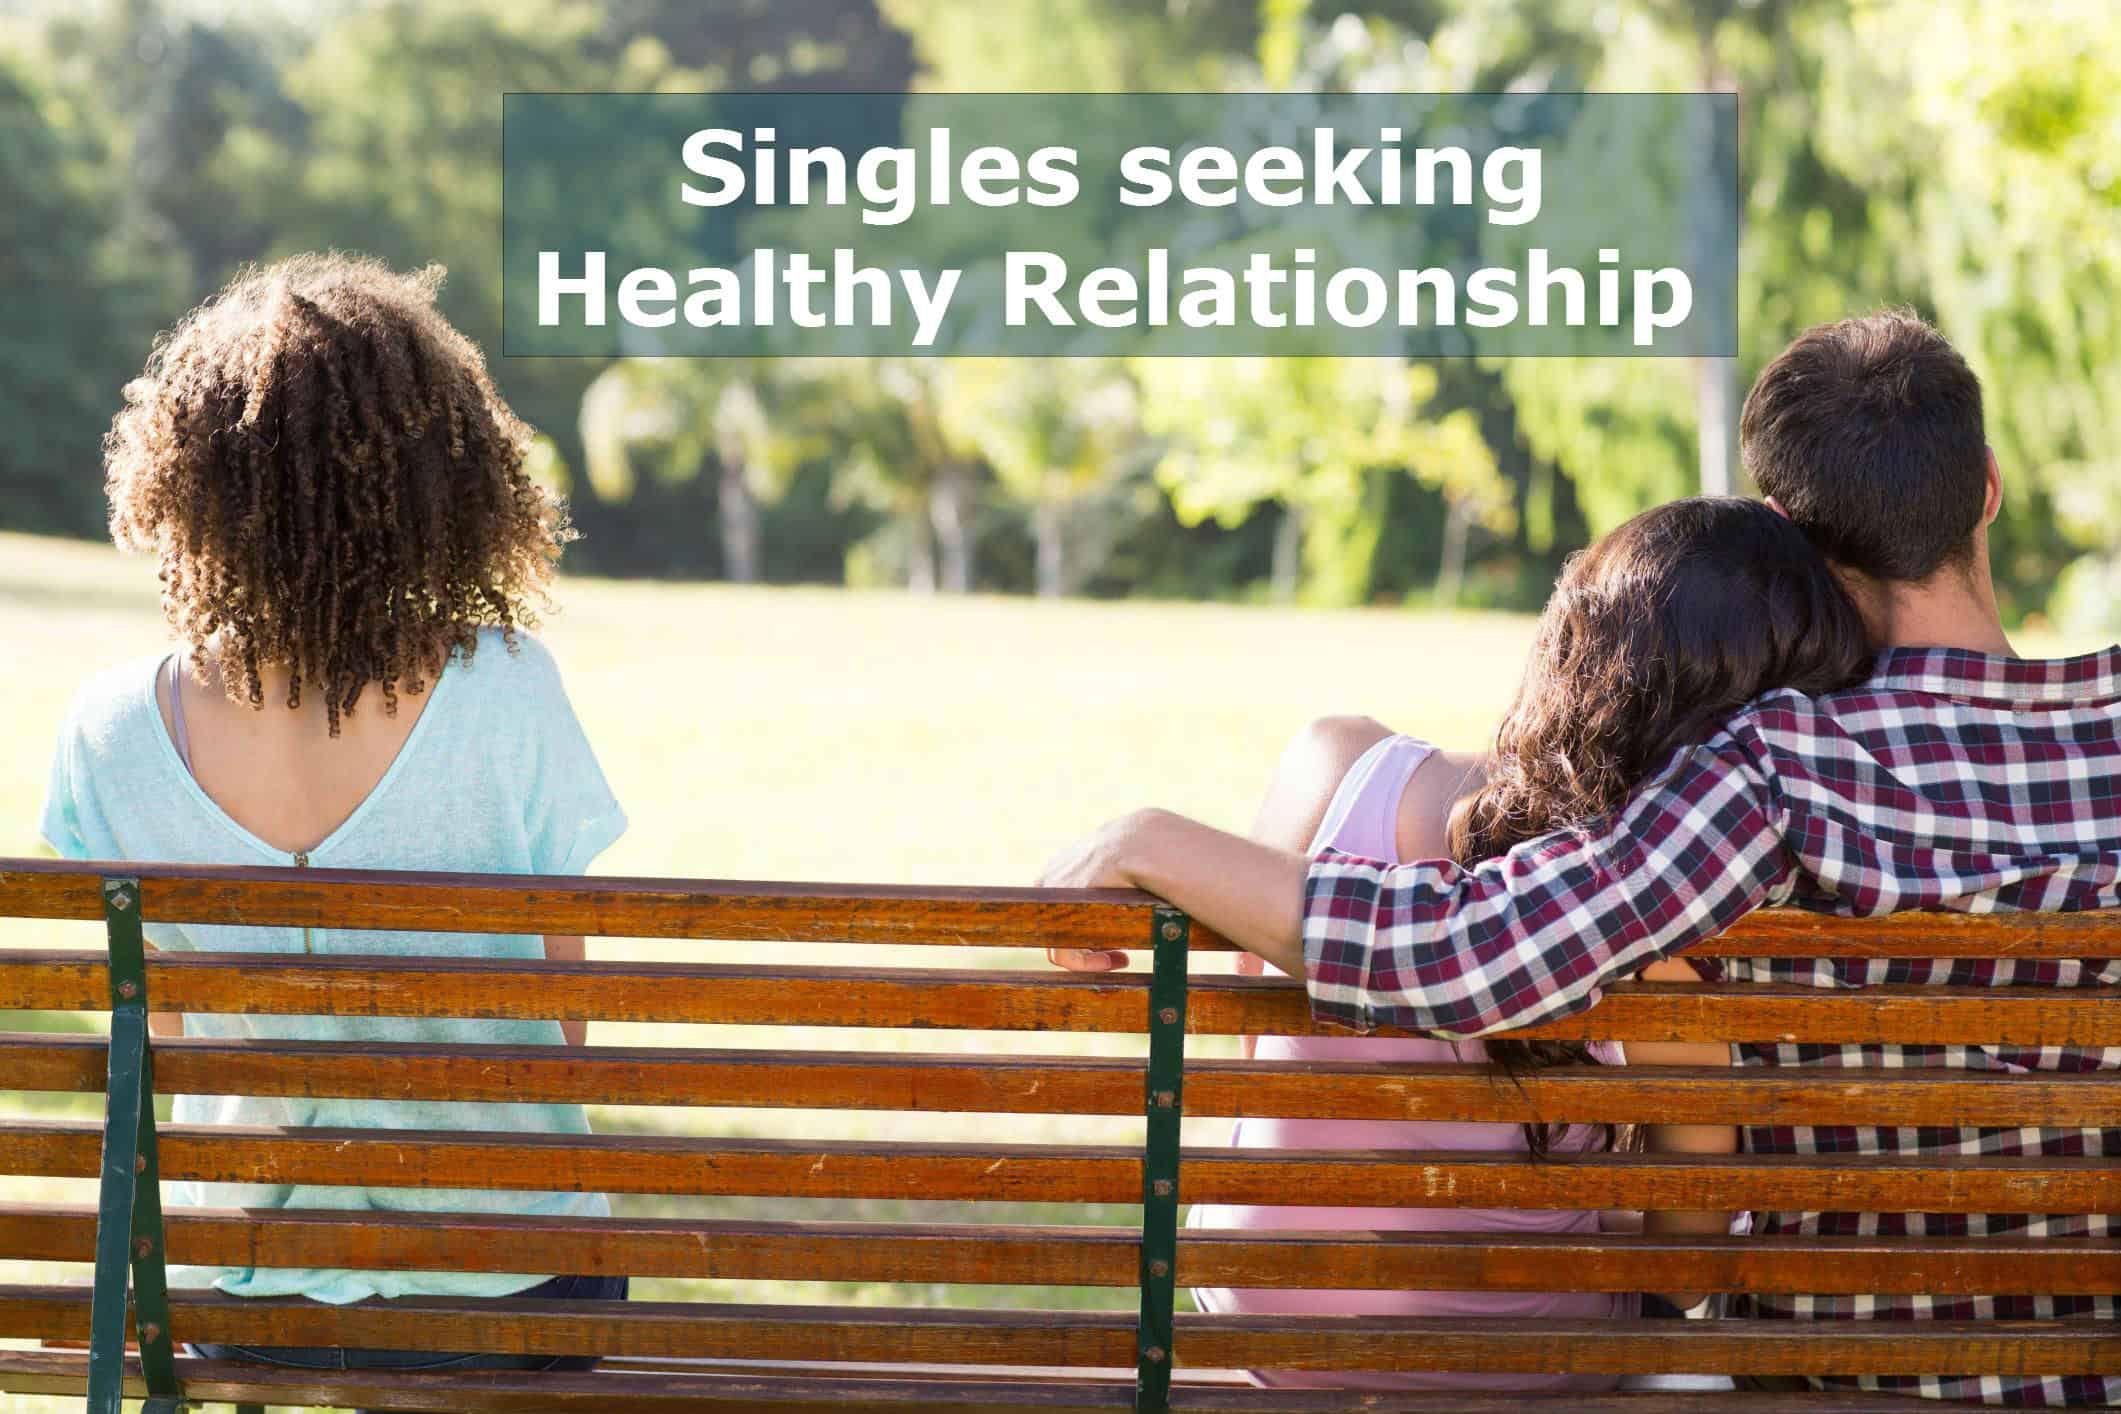 Help for Singles Seeking Healthy Relationships